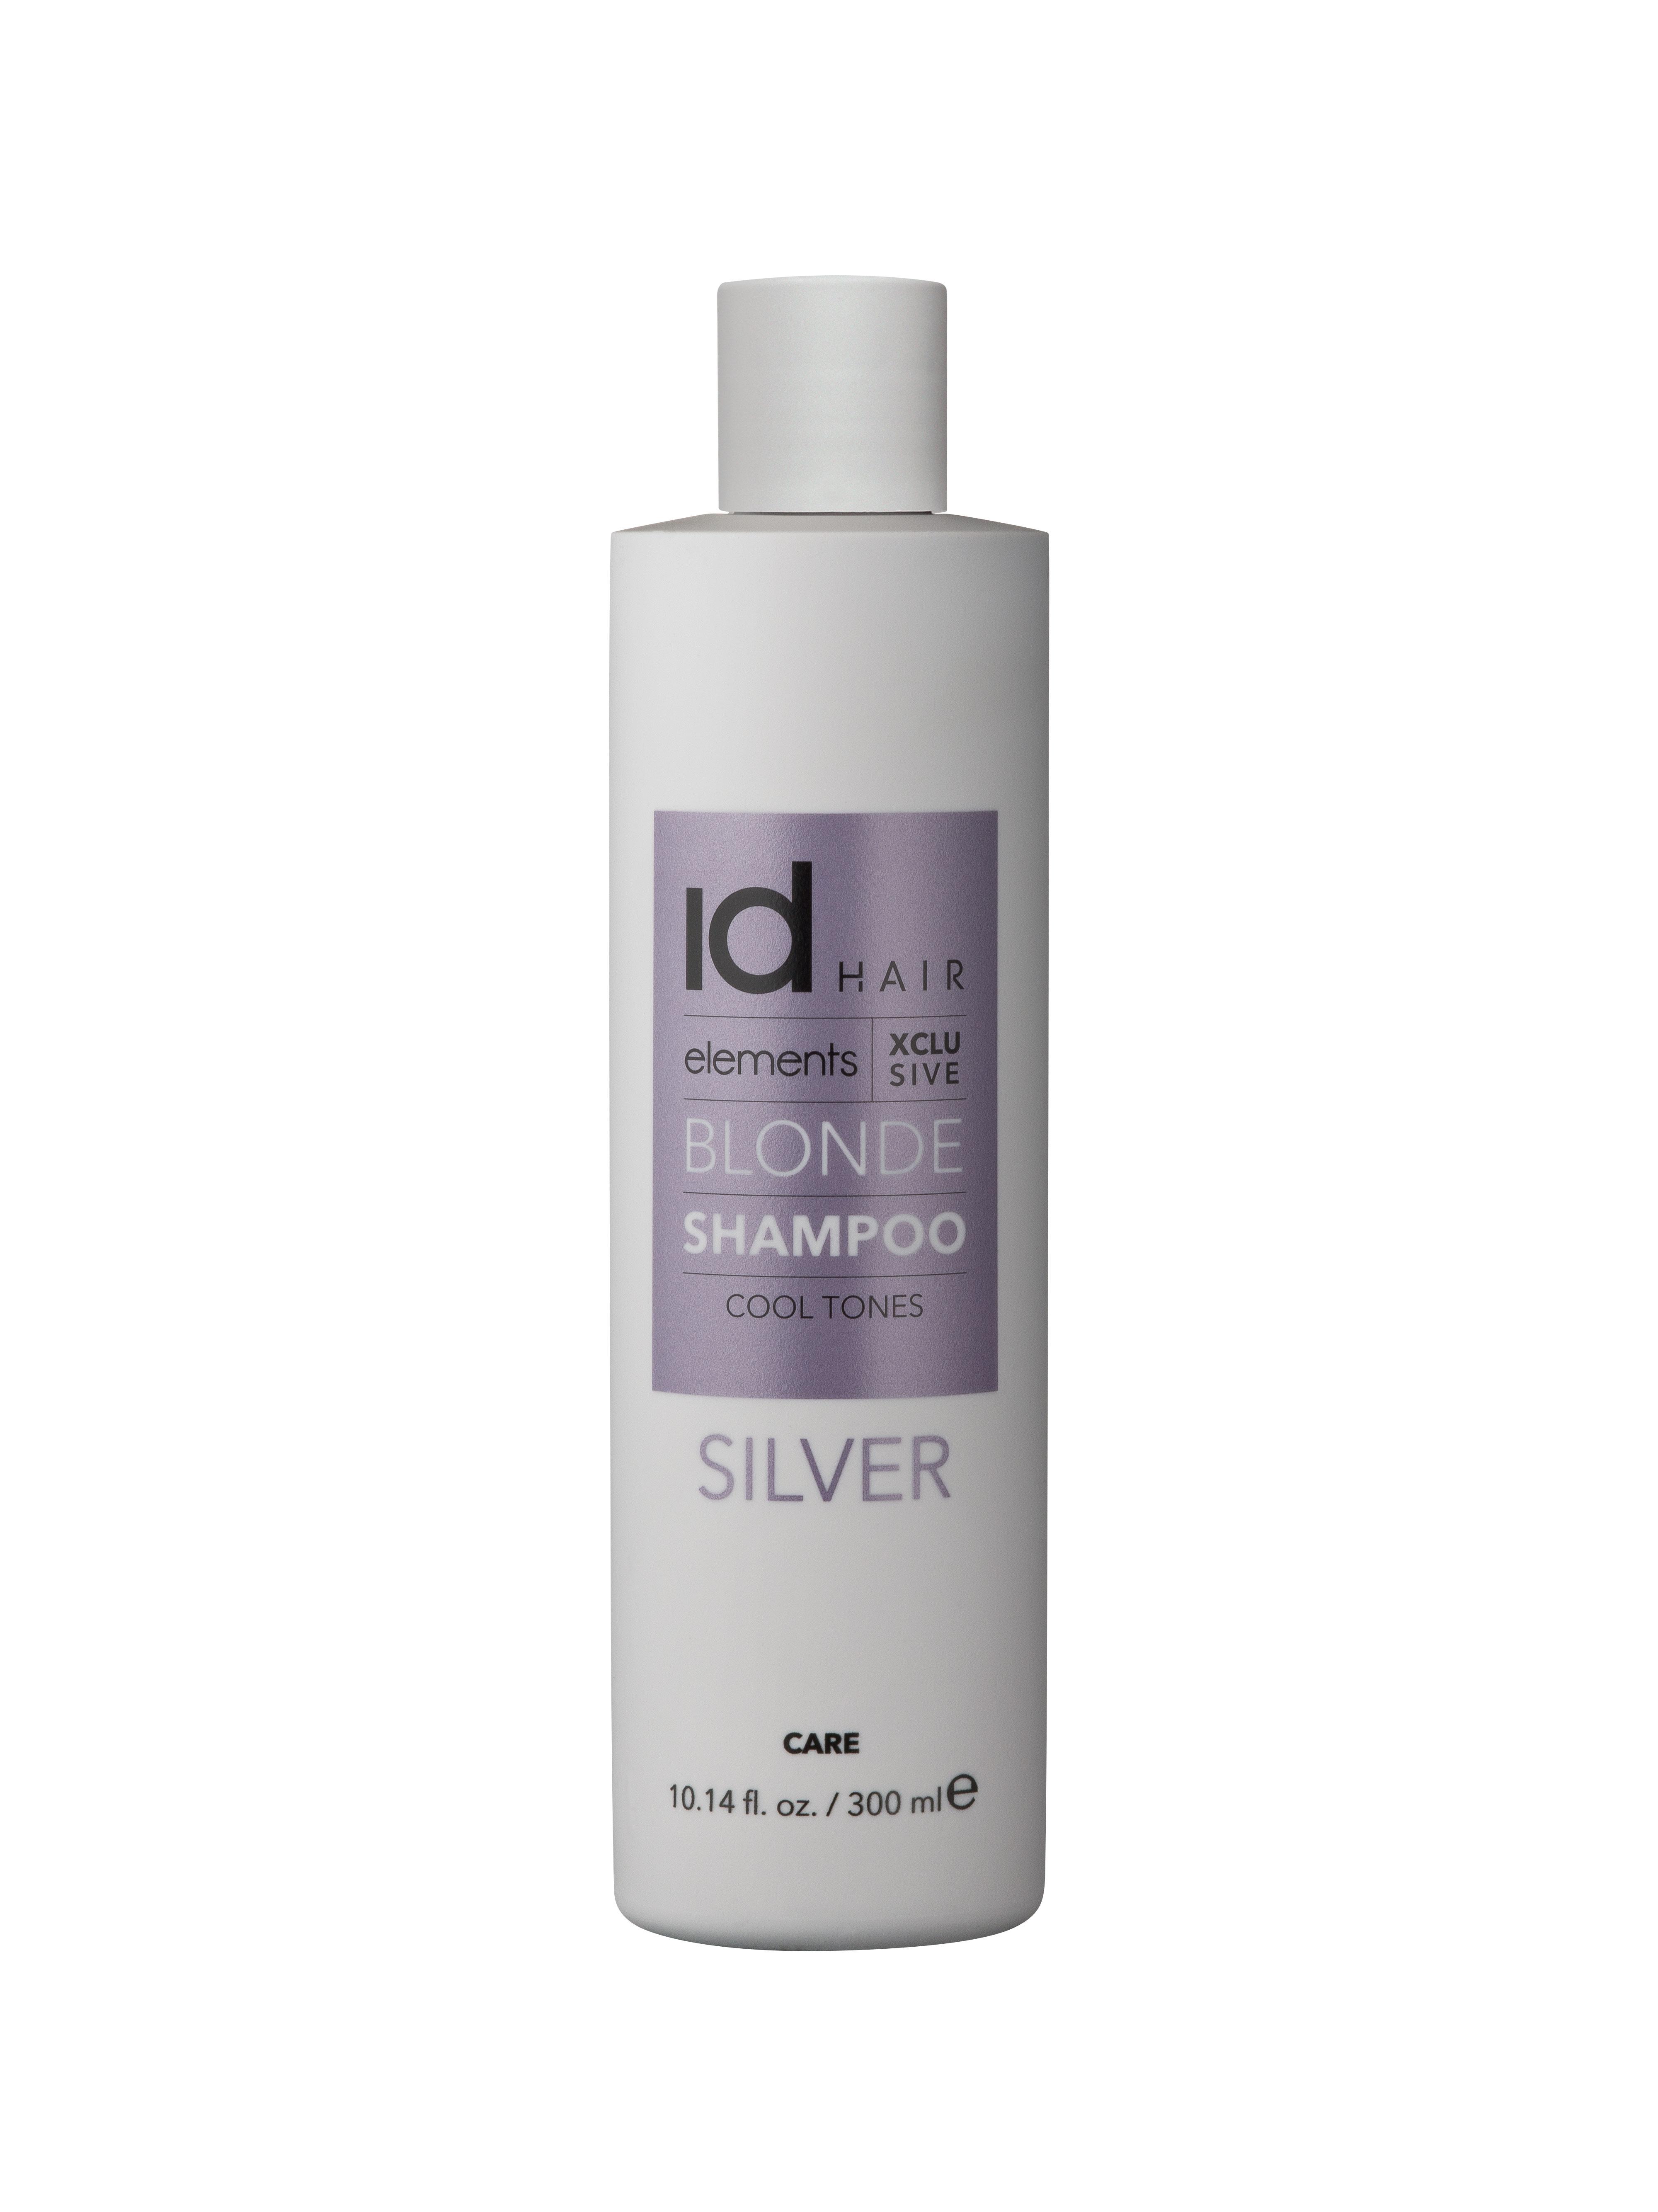 IdHAIR - Elements Xclusive Silver Shampoo 300 ml